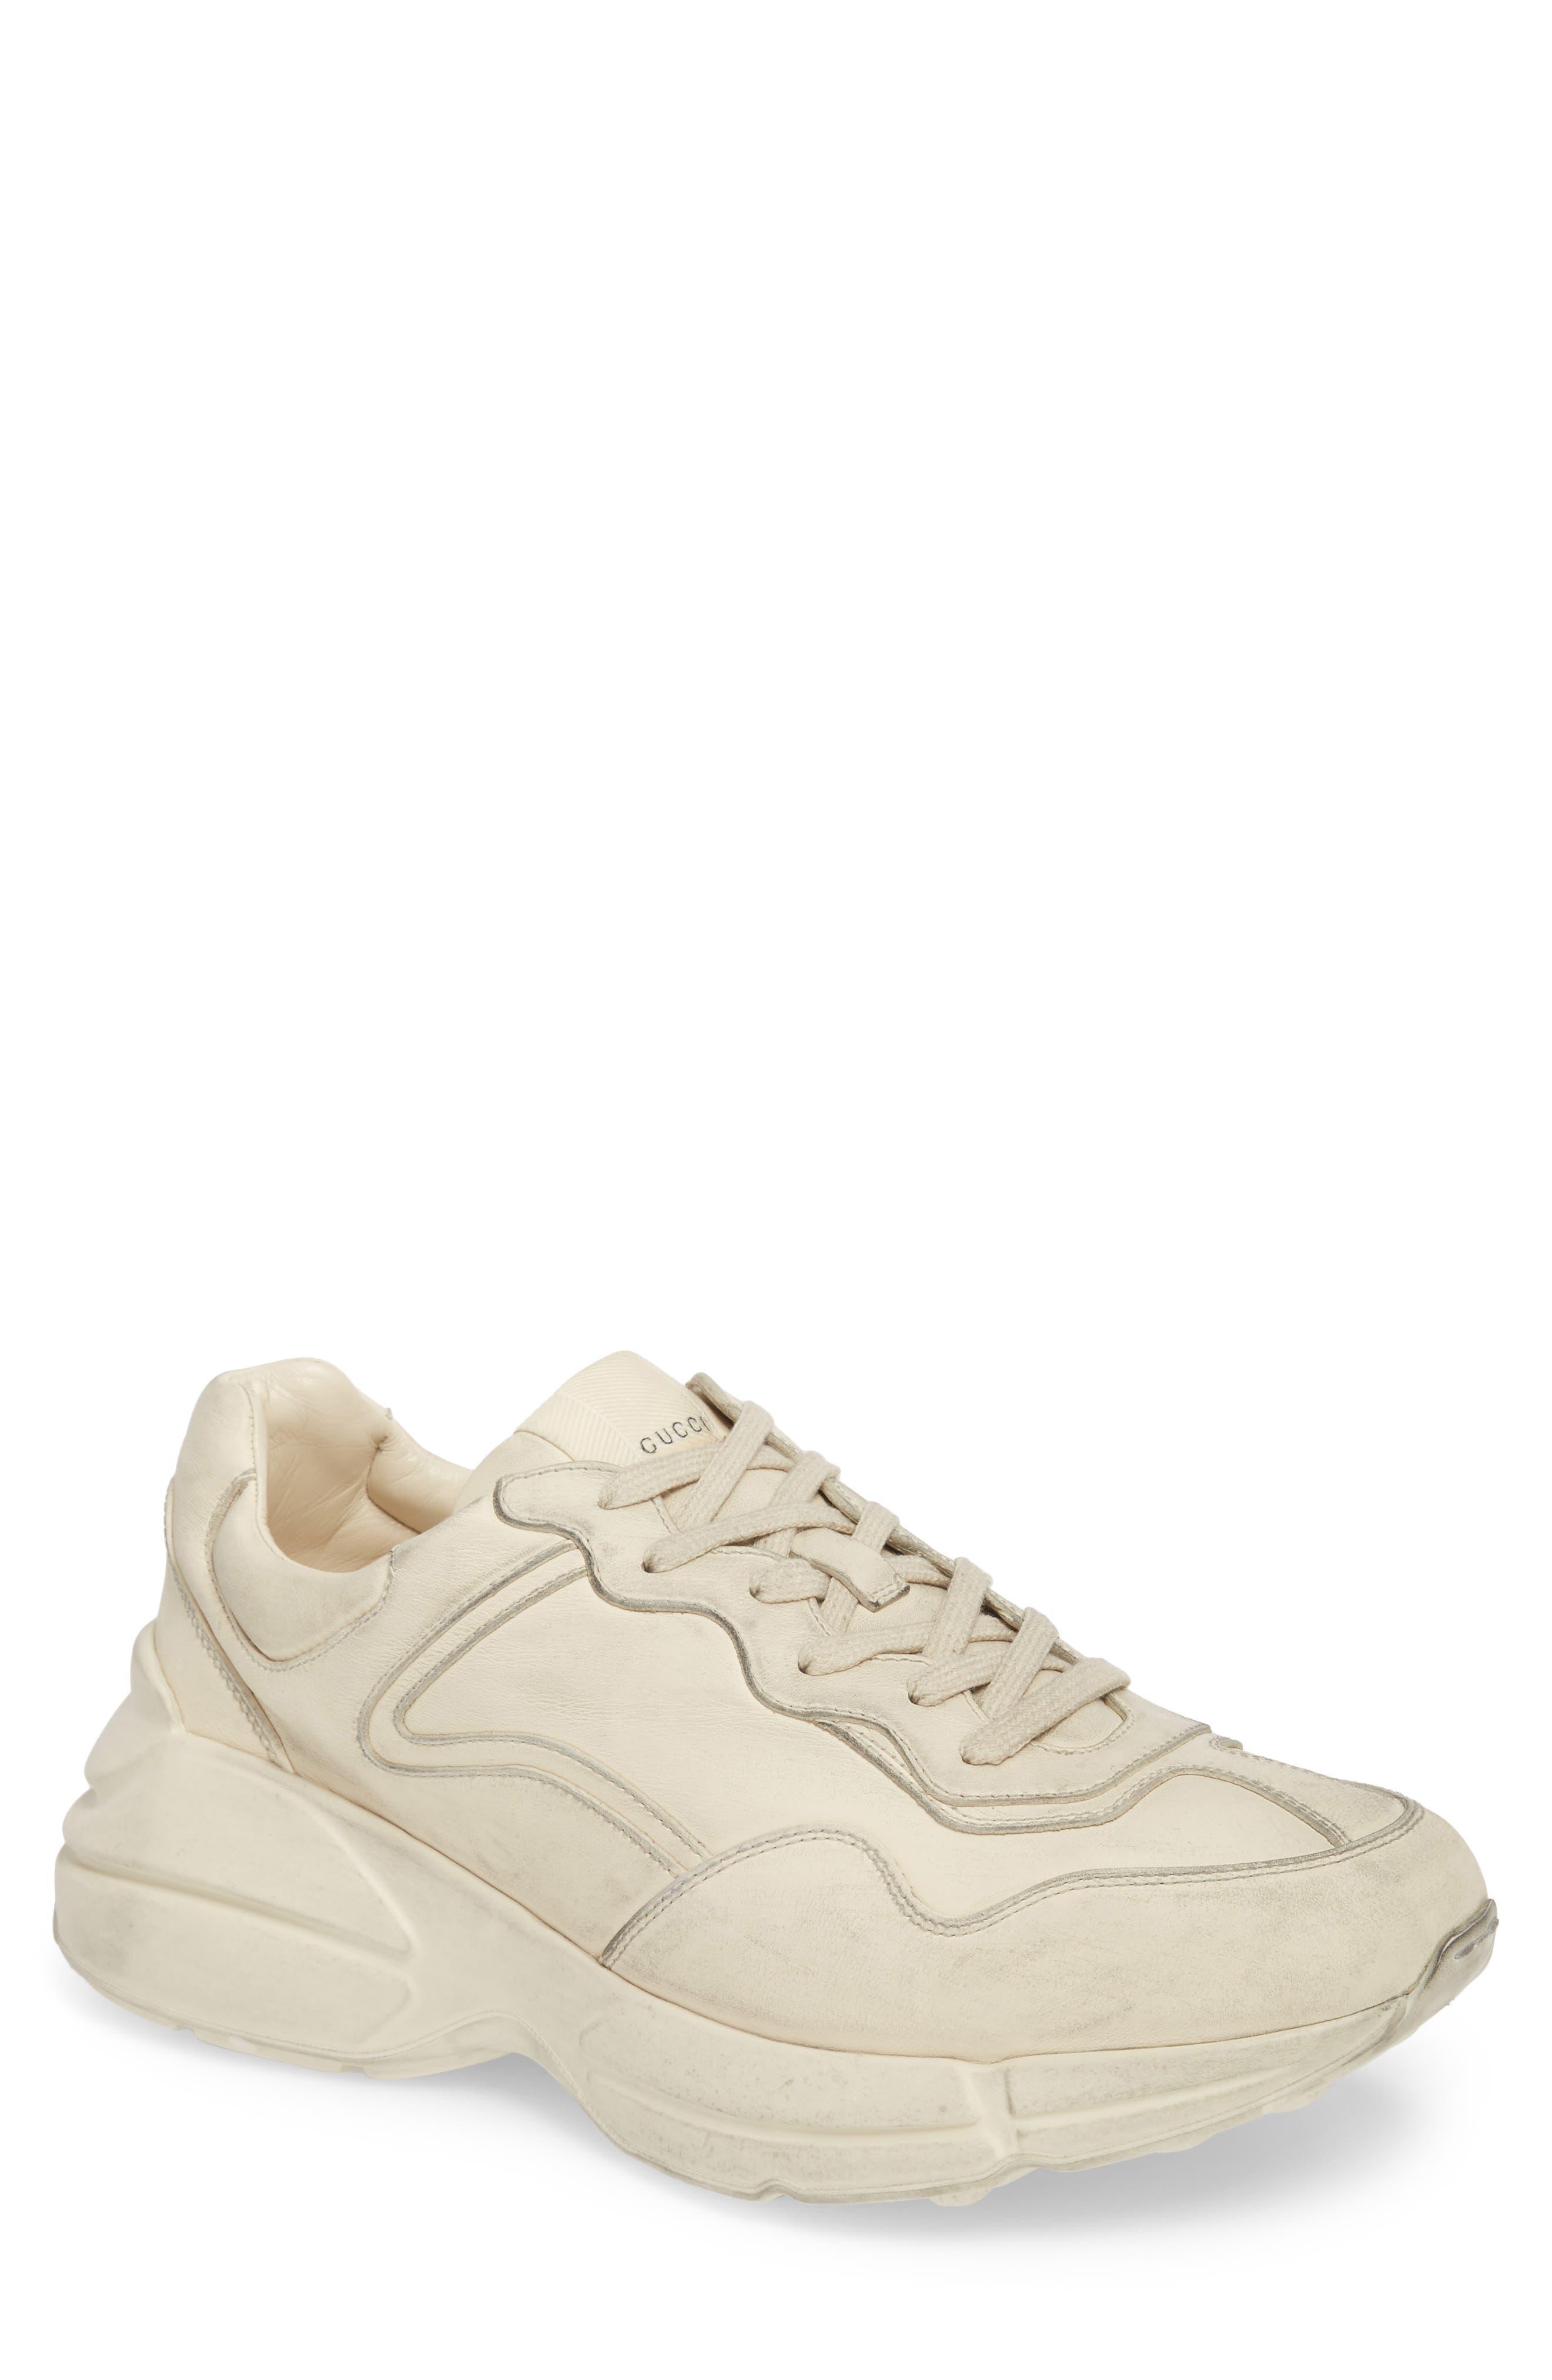 Rhyton Sneaker,                         Main,                         color, Ivory White